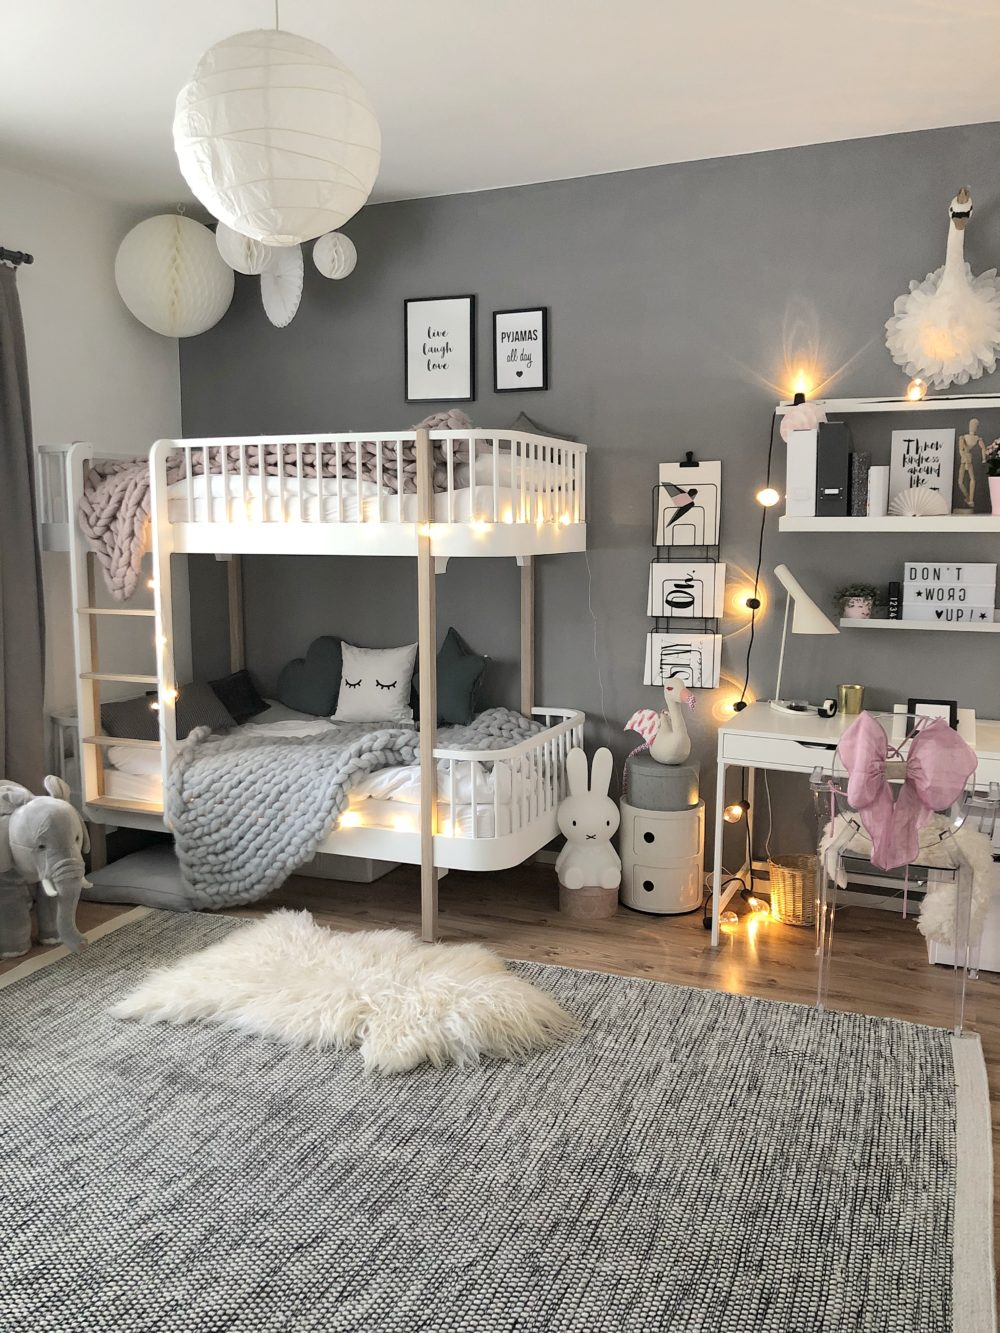 Easyinterieur Kinderzimmer Schreibtisch Bett